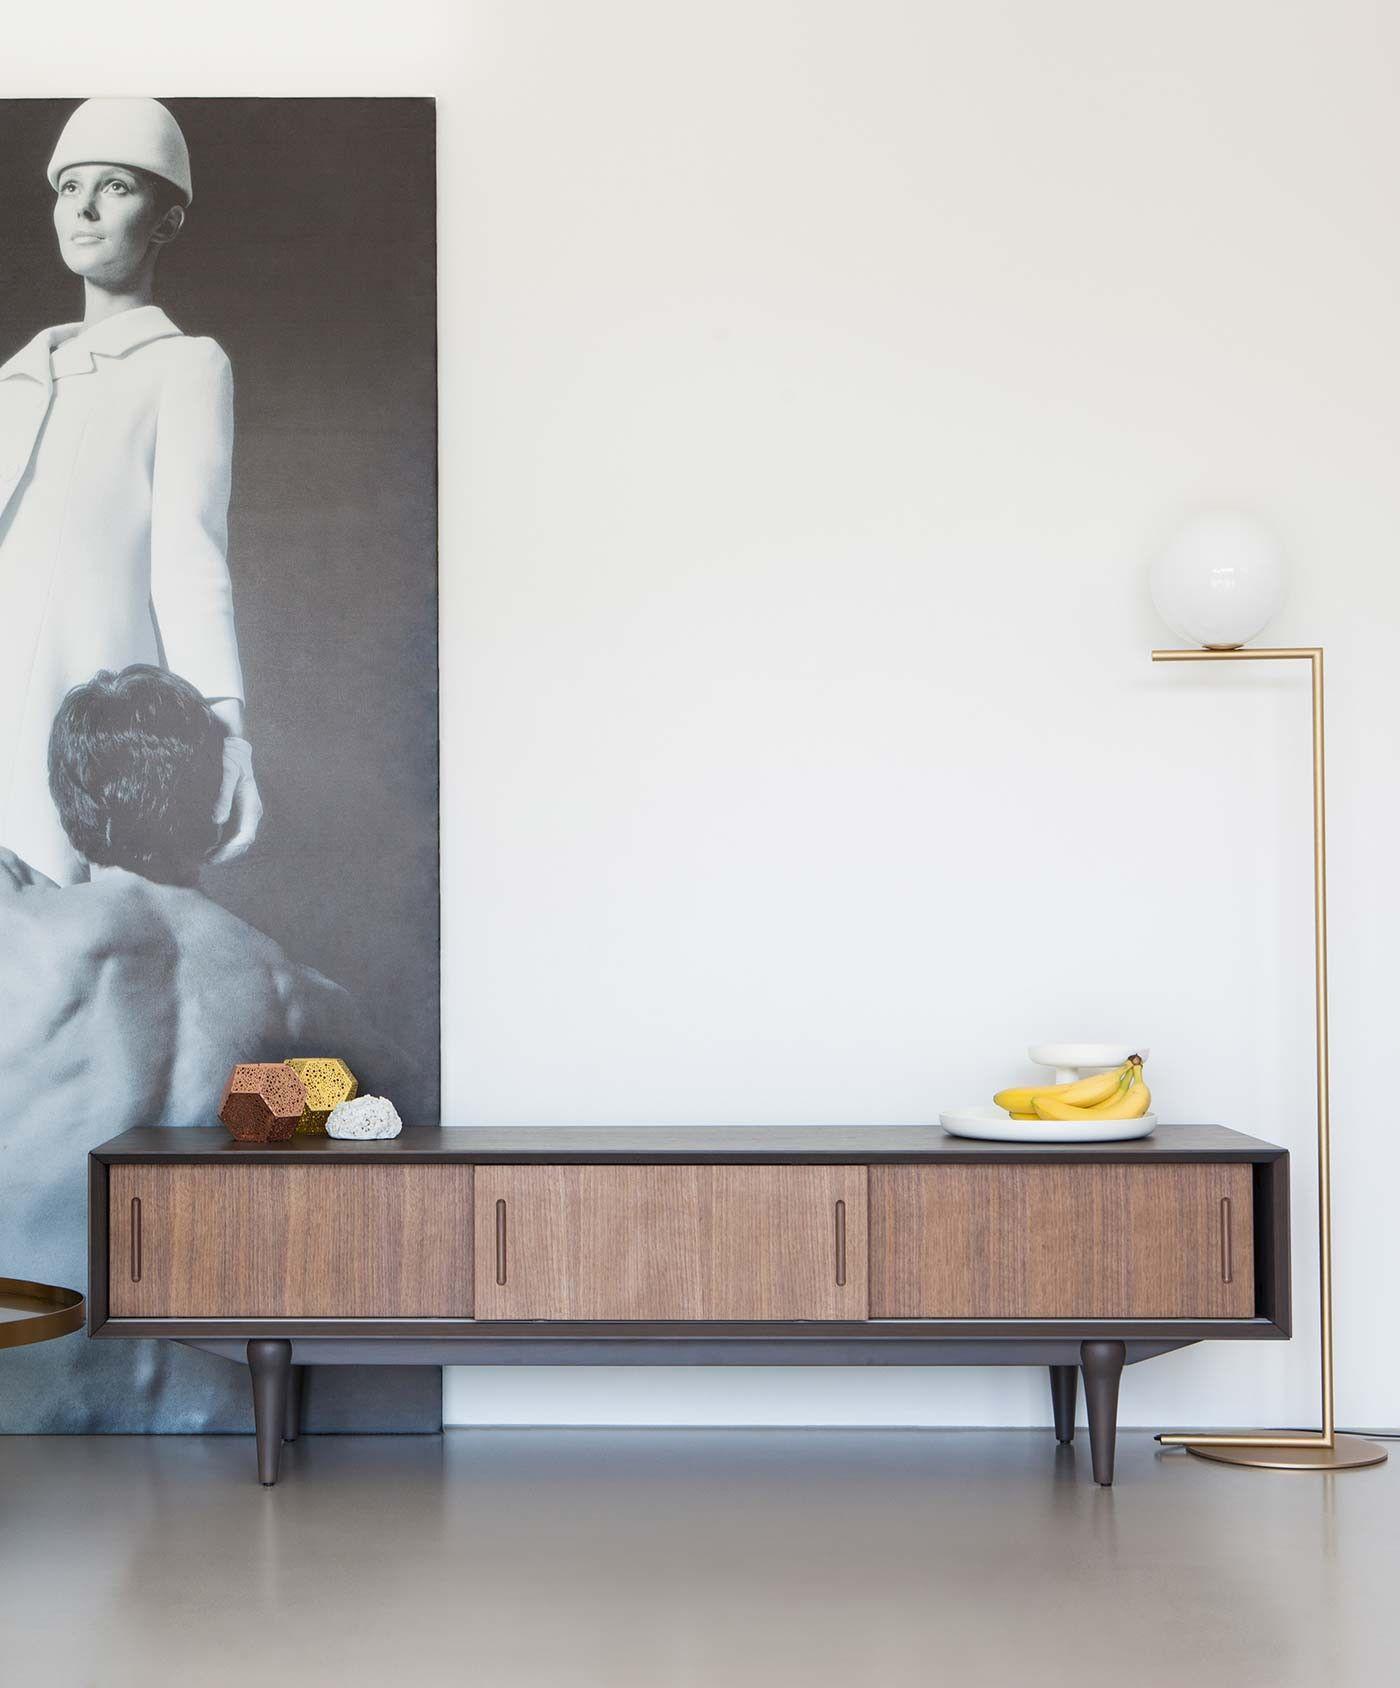 Boomerang Tv Meubel.Ruijch Retro Tv Meubel Home Decor Home Decor Inspiration